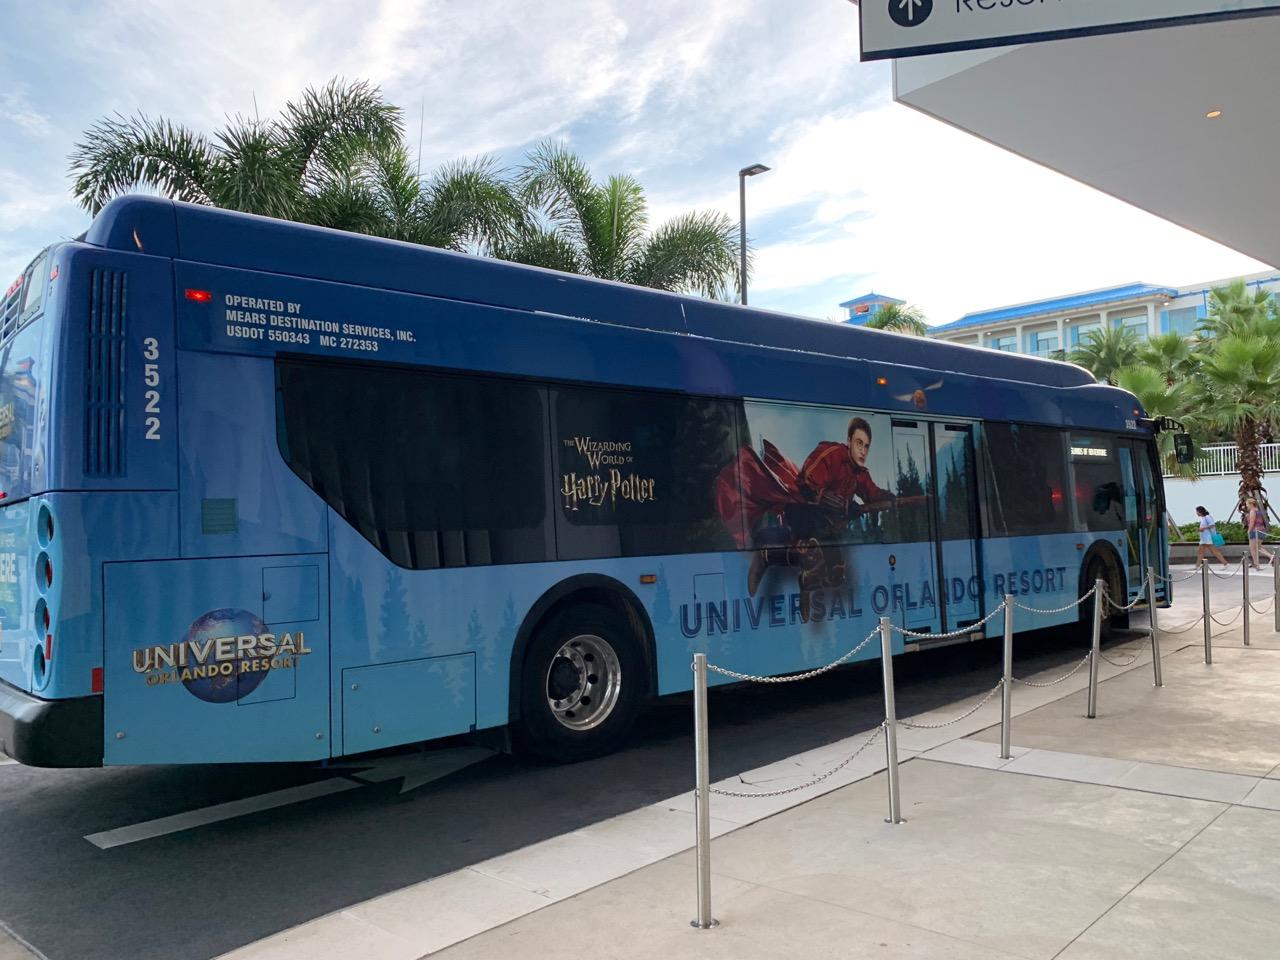 universal studios orlando trip vacation planinng guide 15 bus.jpeg